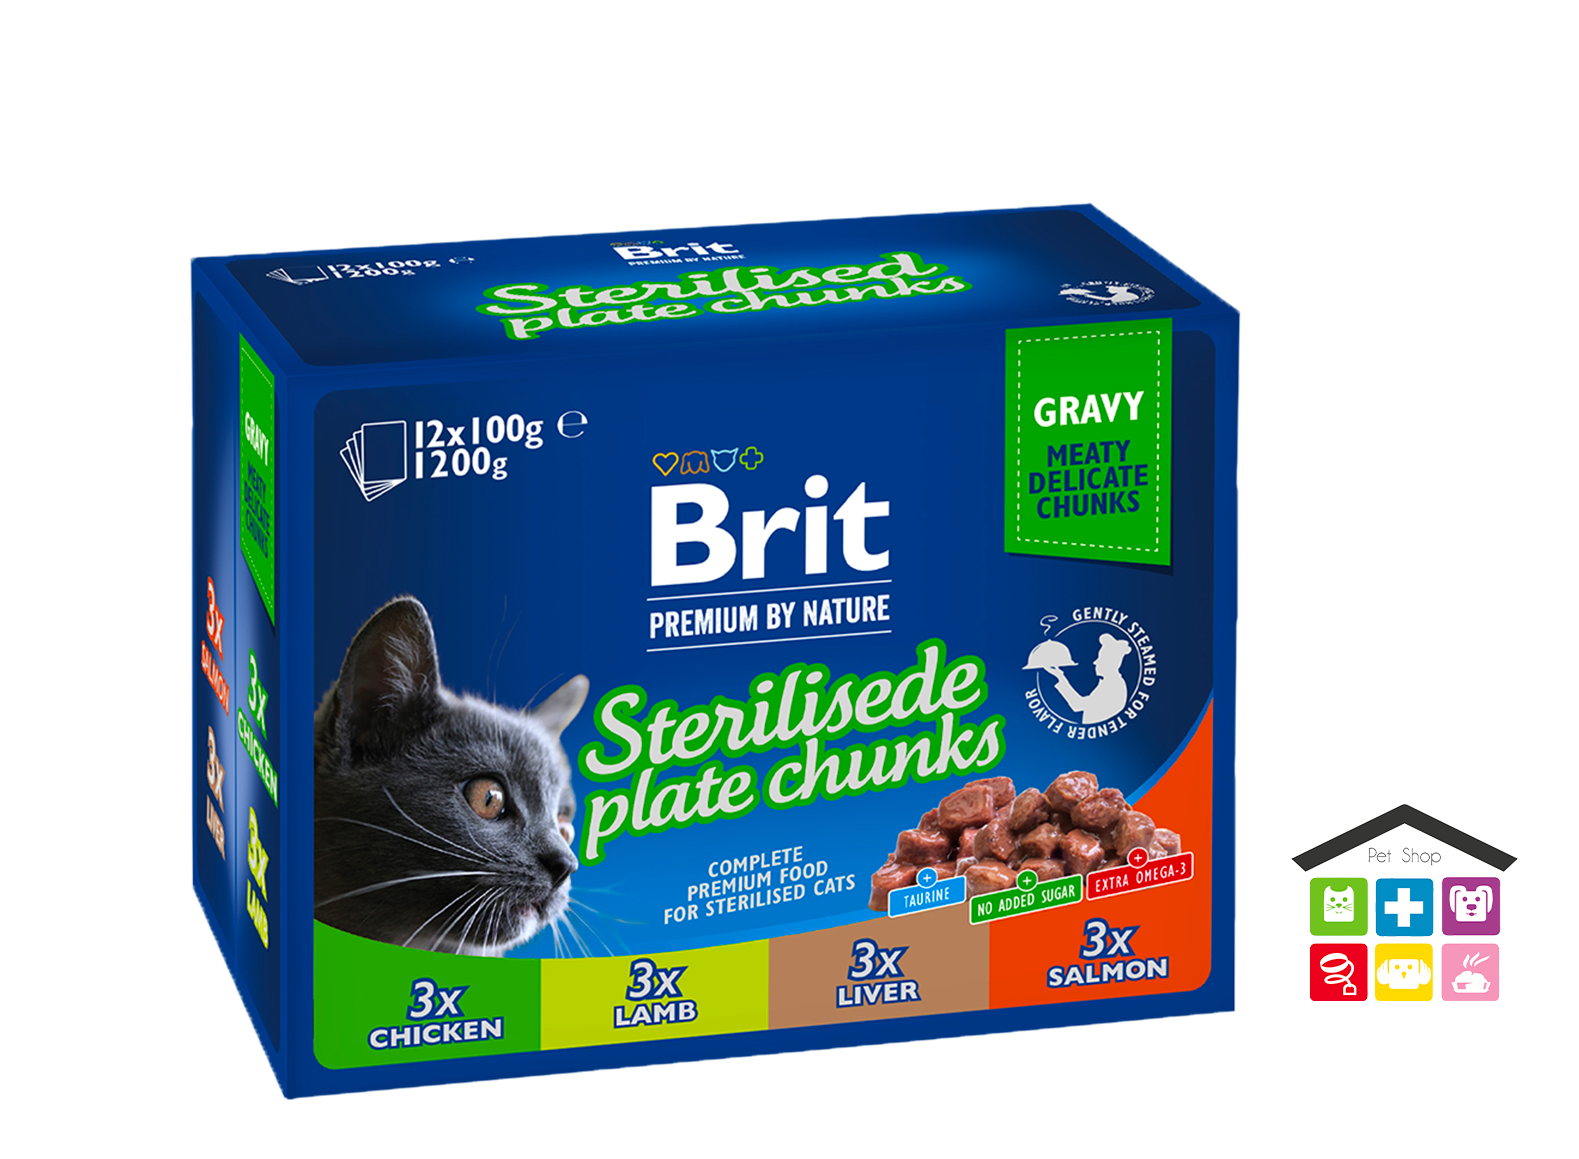 Brit Premium by Nature STERILISED PLATE CHUNKS, 12pack